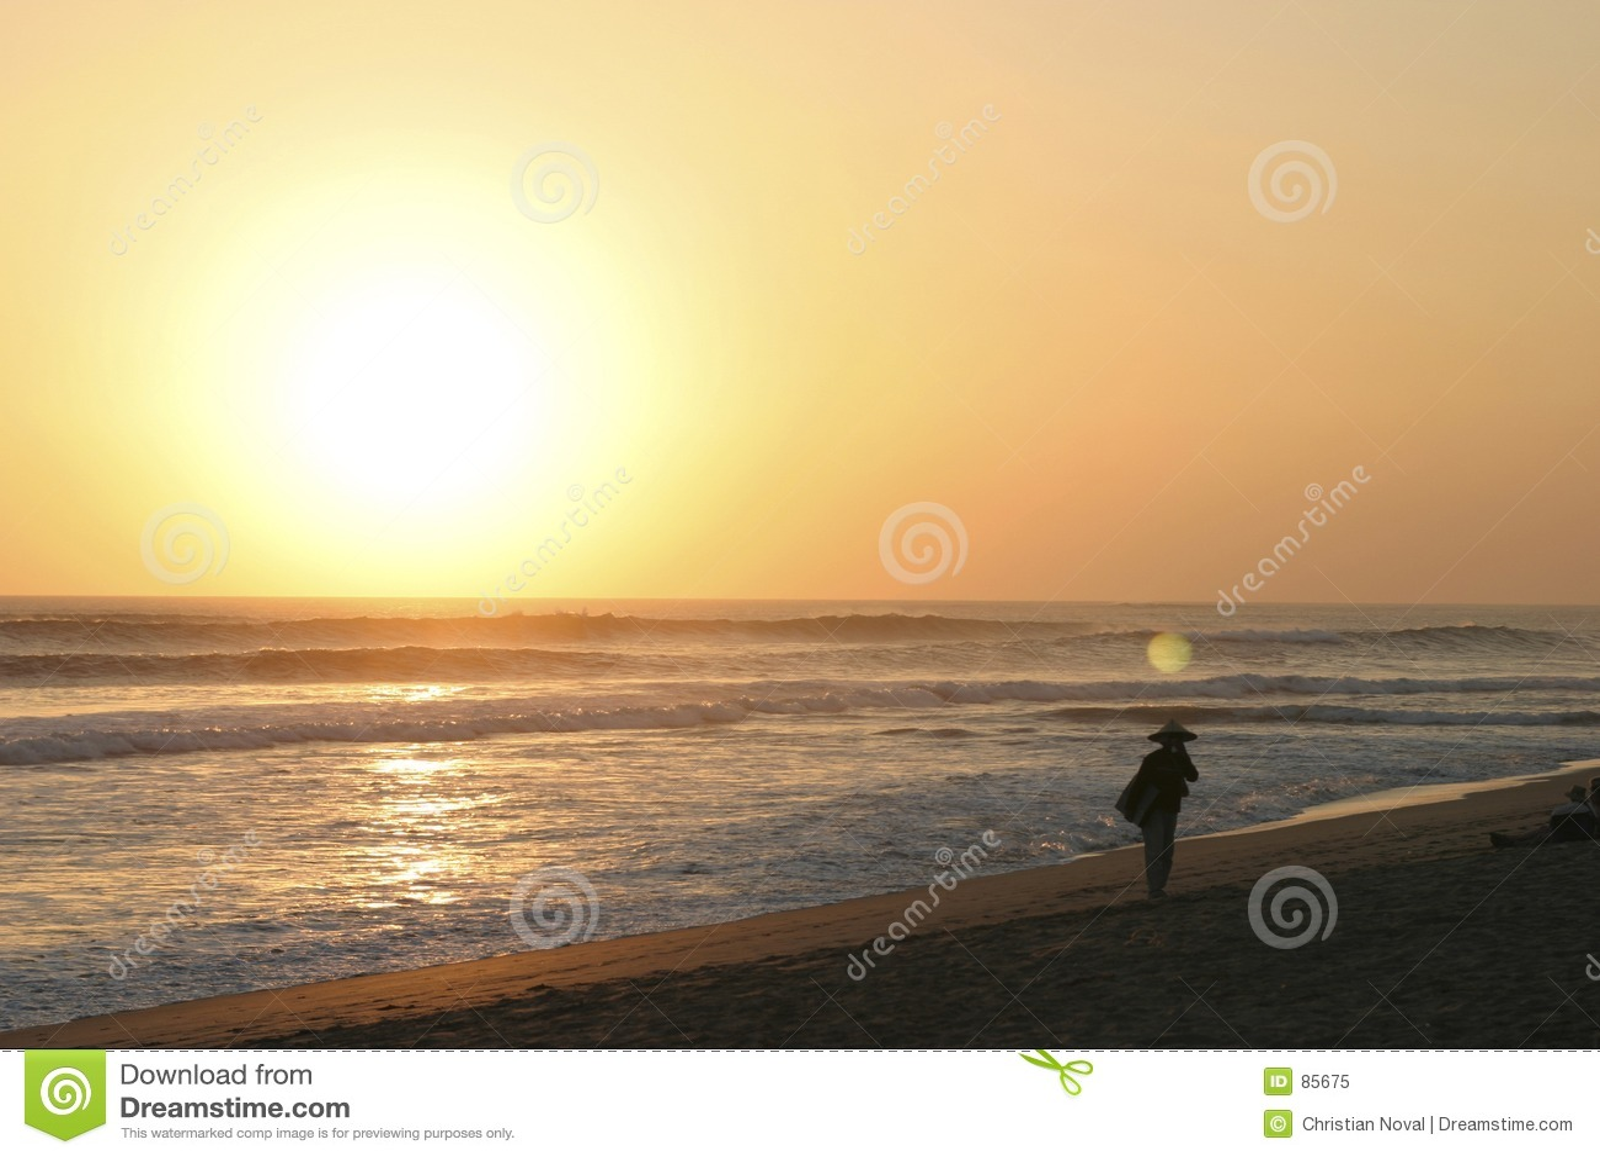 Plaży bali kuta słońca